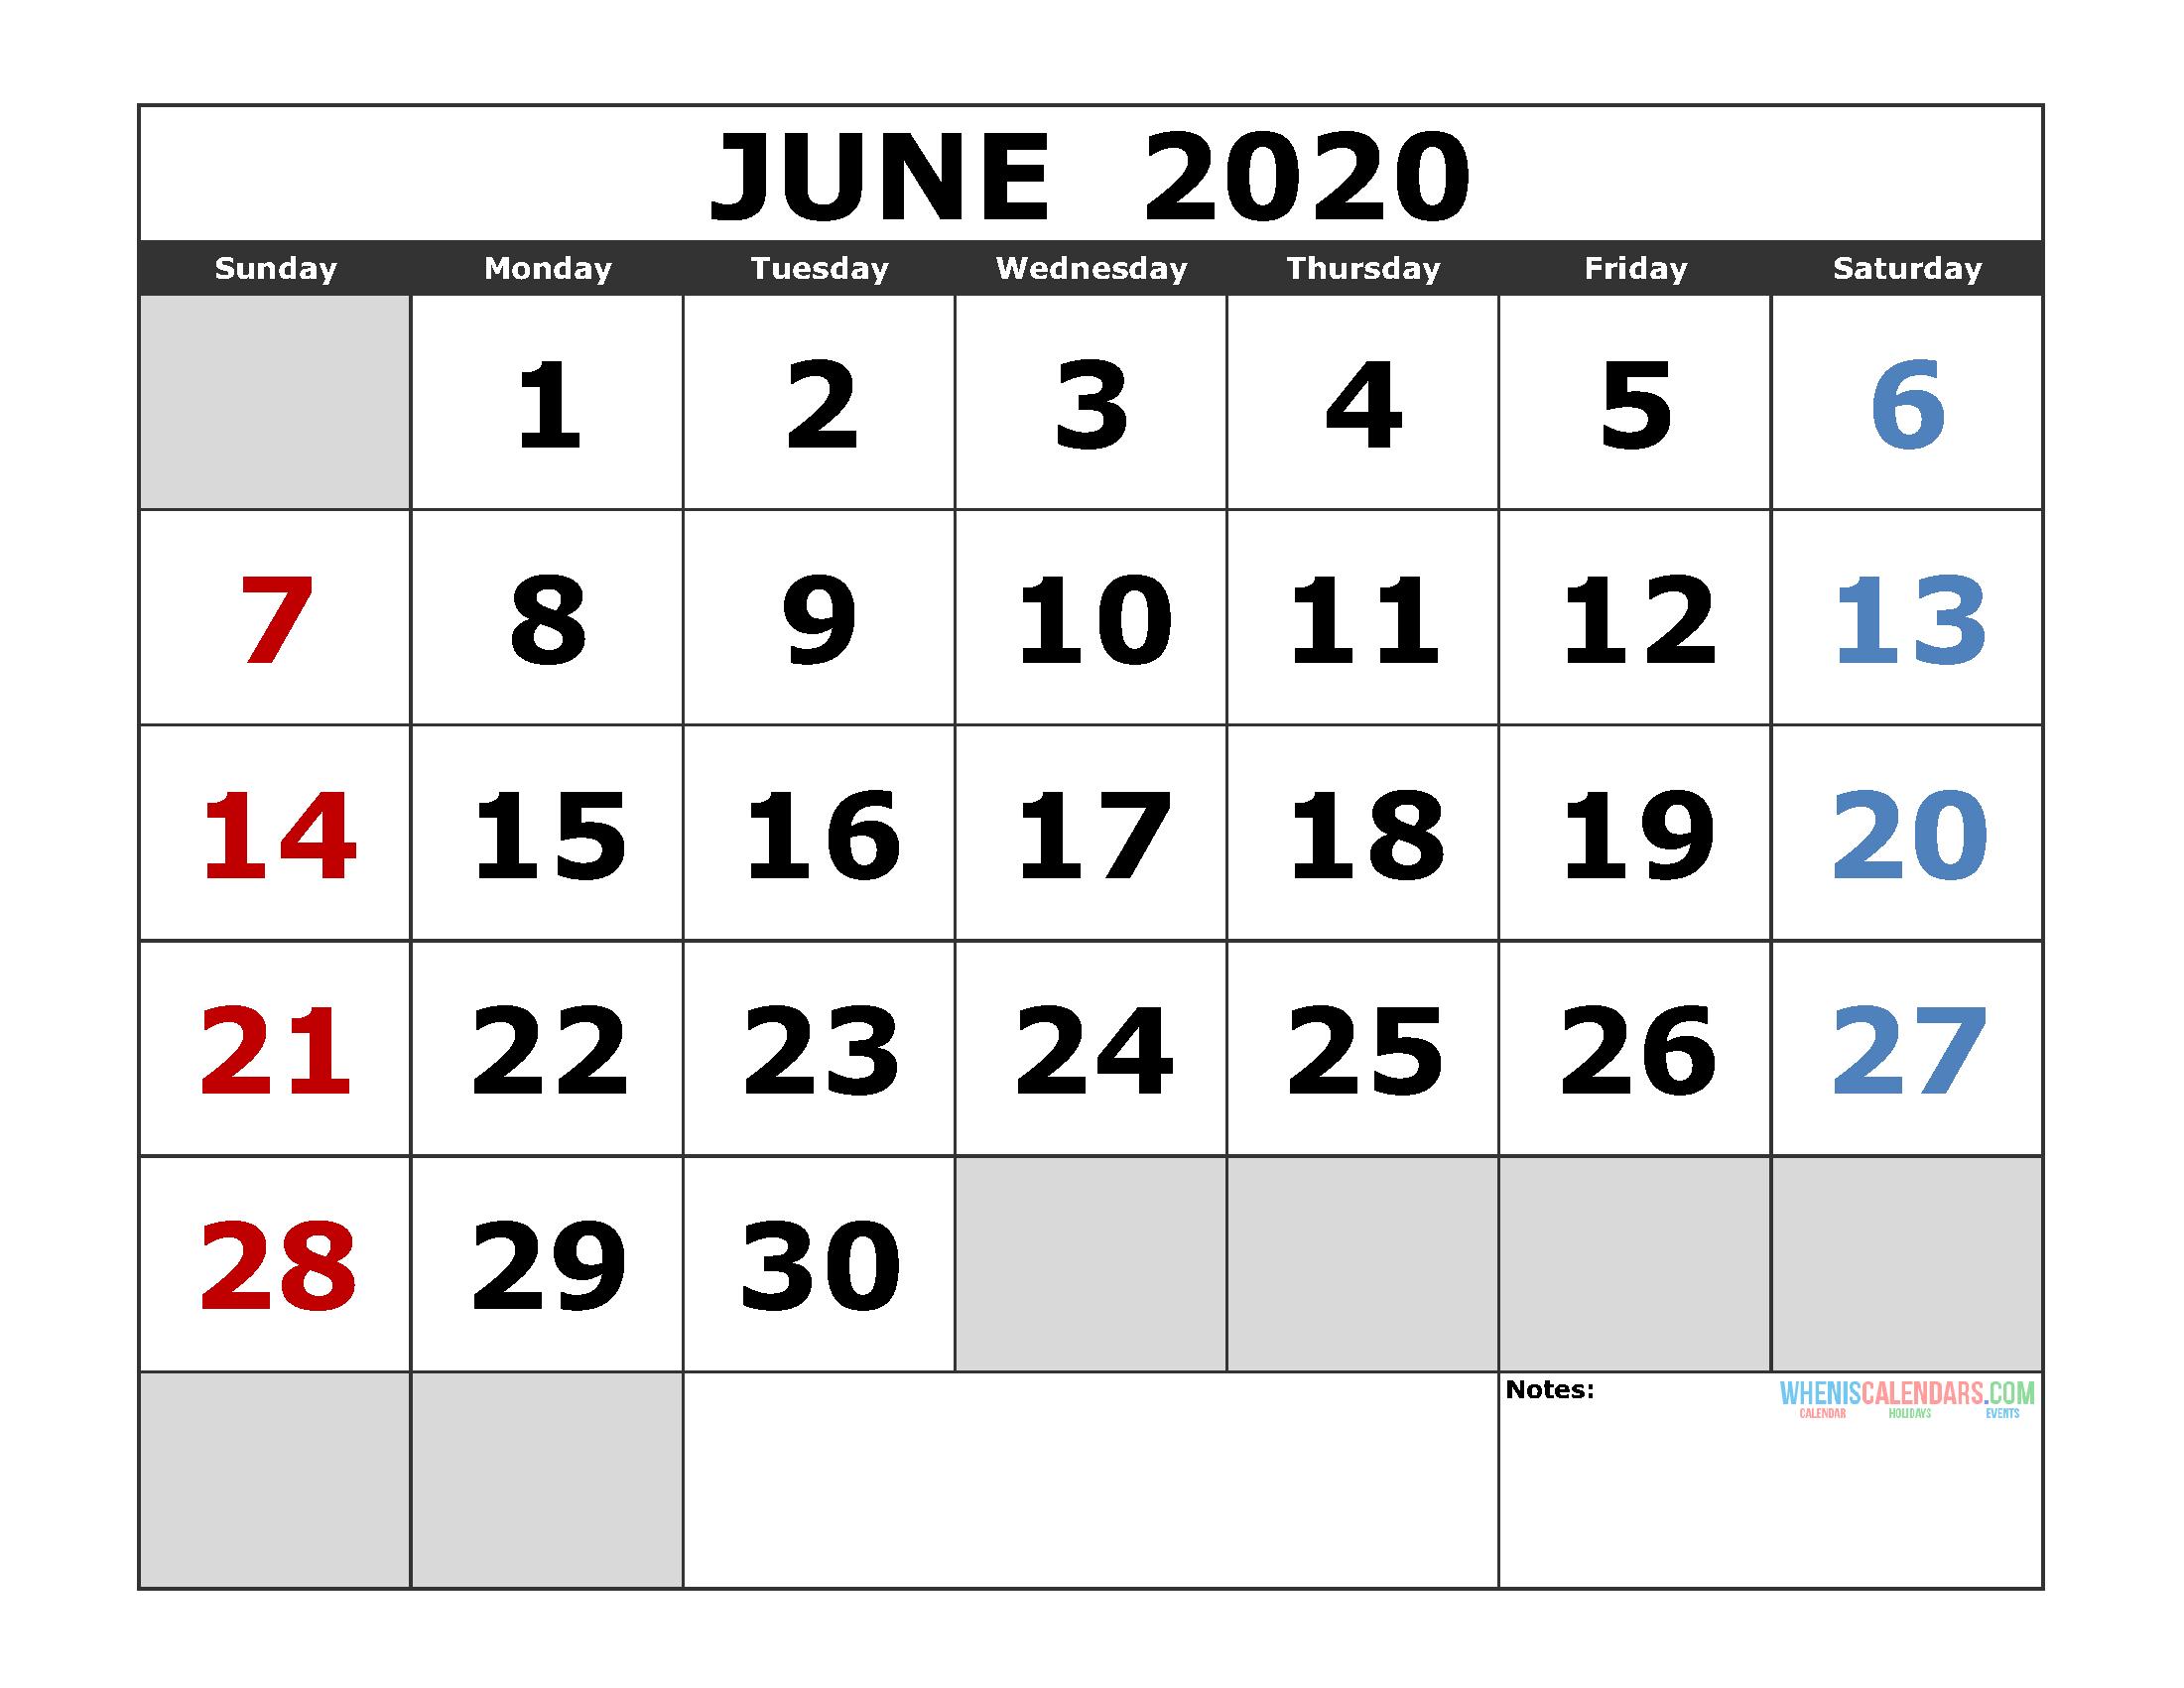 June 2020 Printable Calendar Template Excel, Pdf, Image [Us intended for 3 Month Calendar 2020 Excel